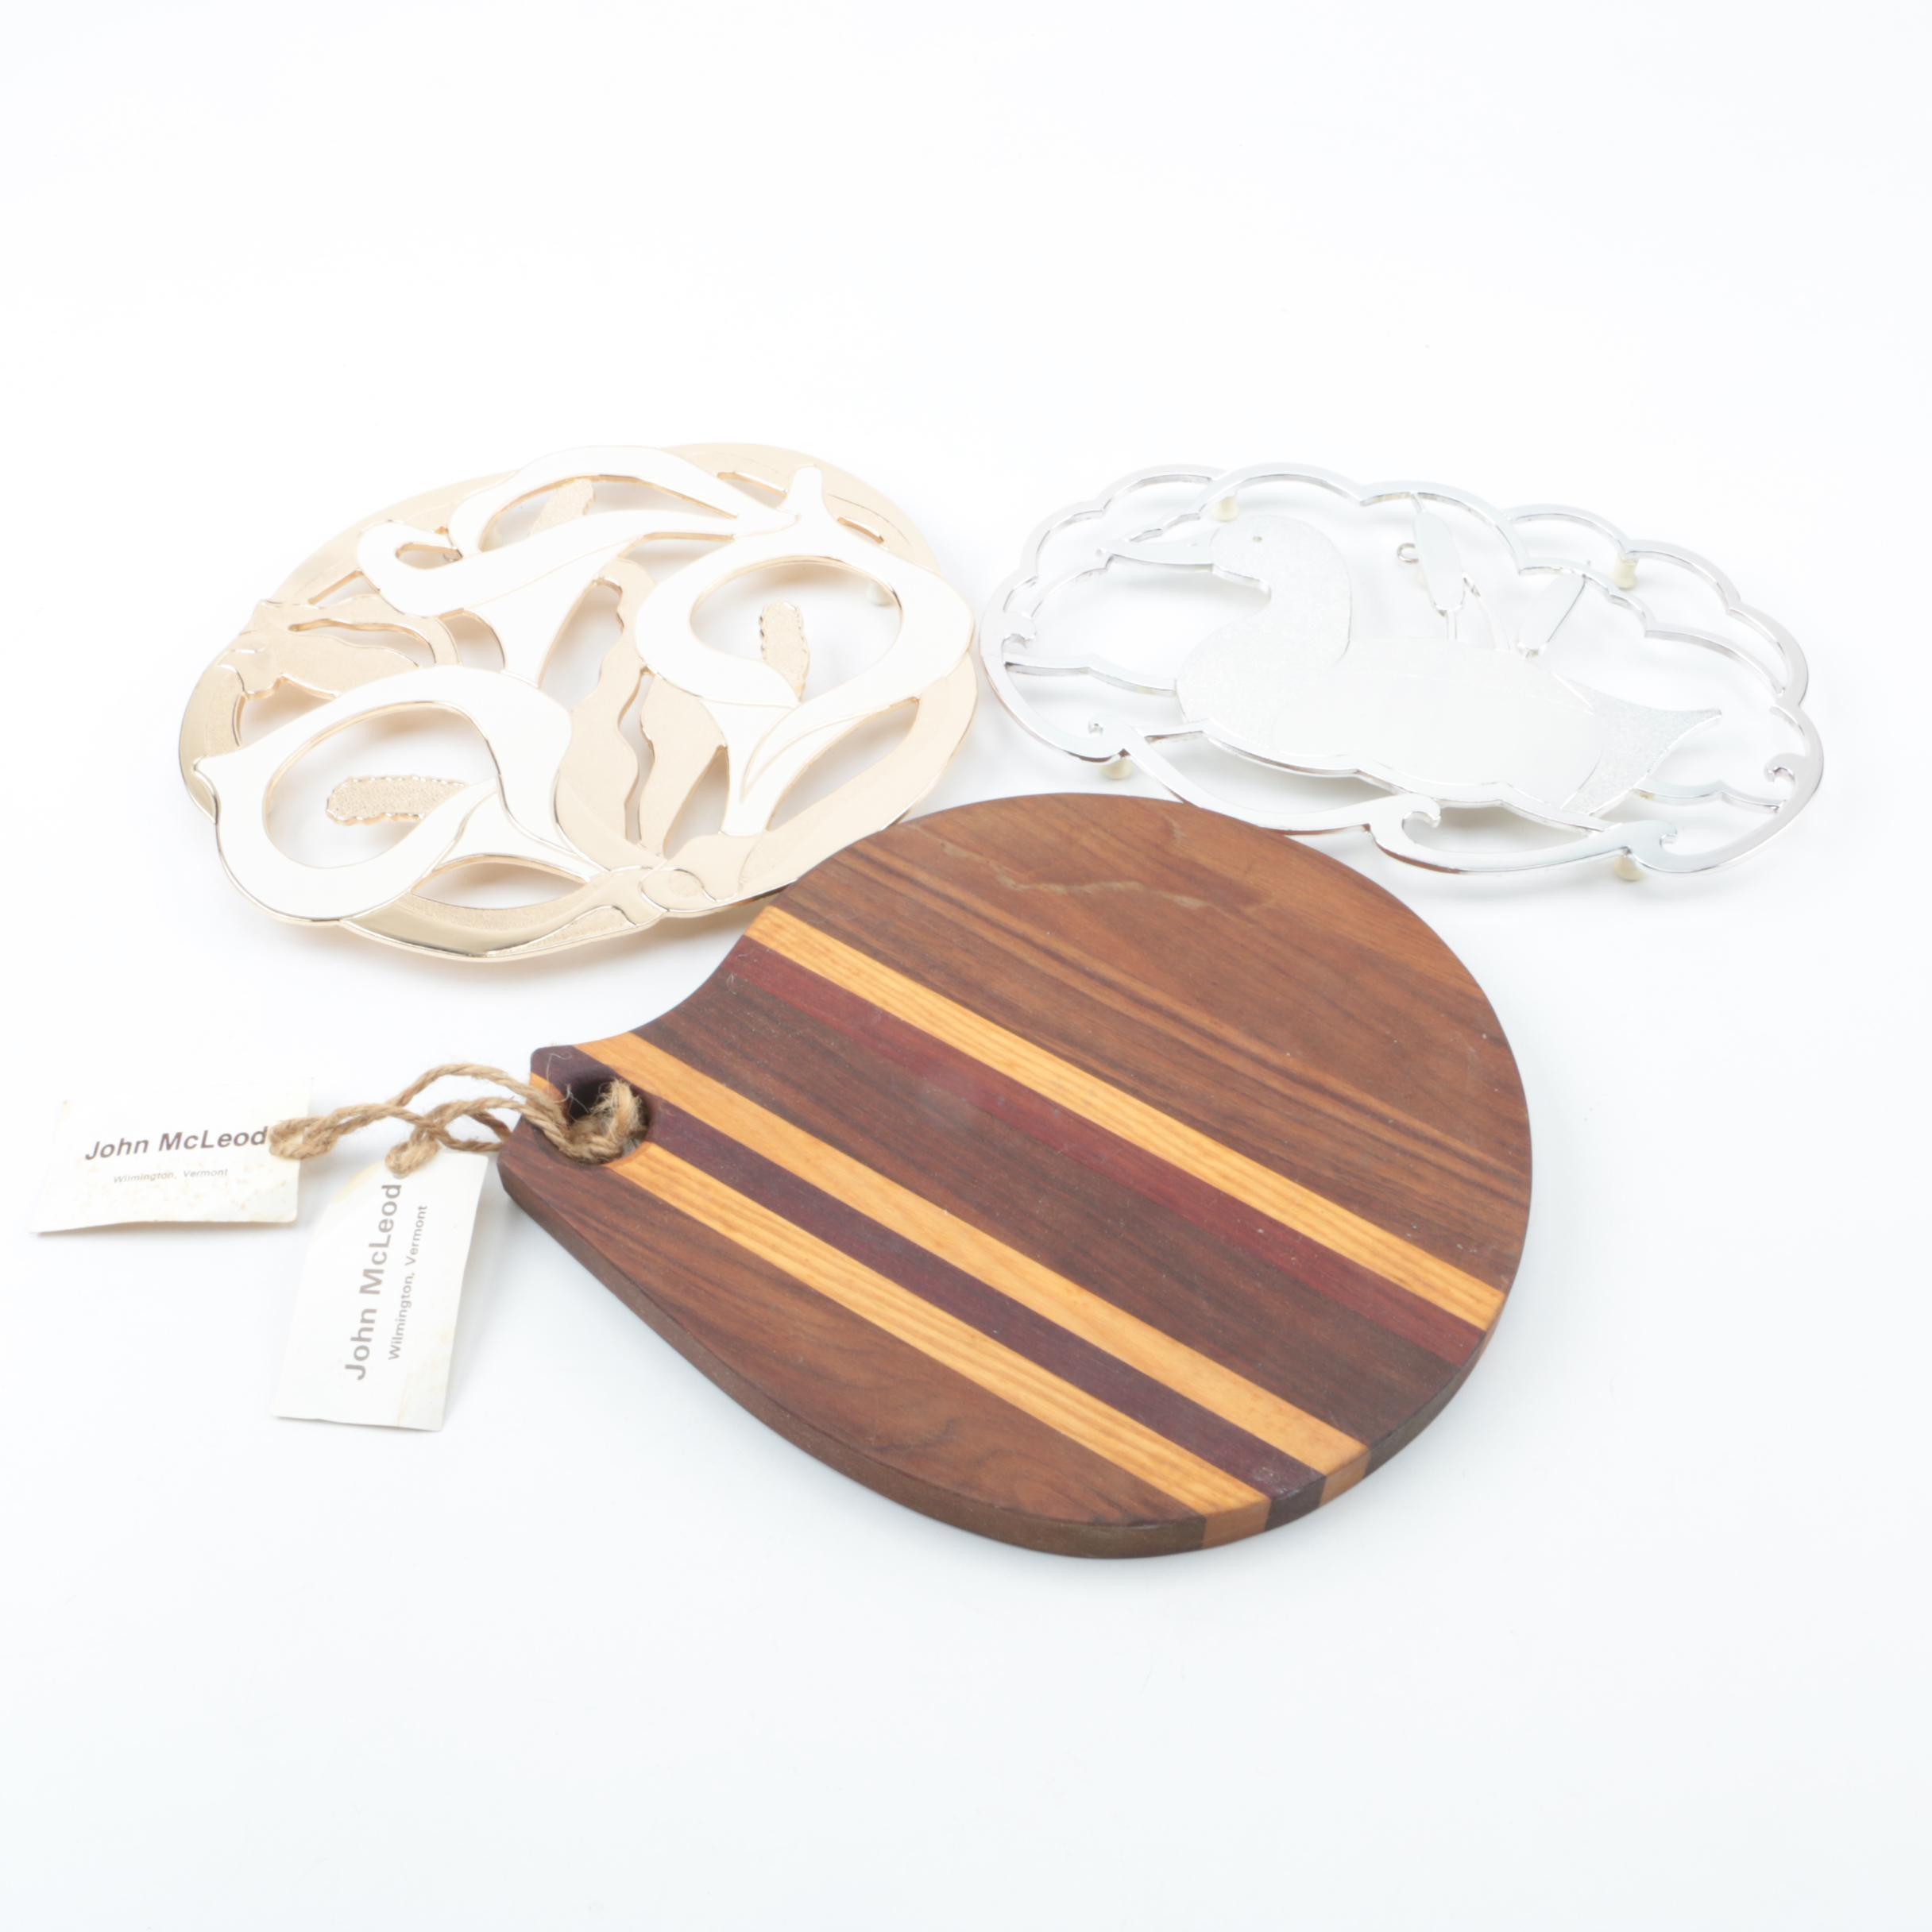 Metal Trivets and John McLeod Wooden Cutting Board